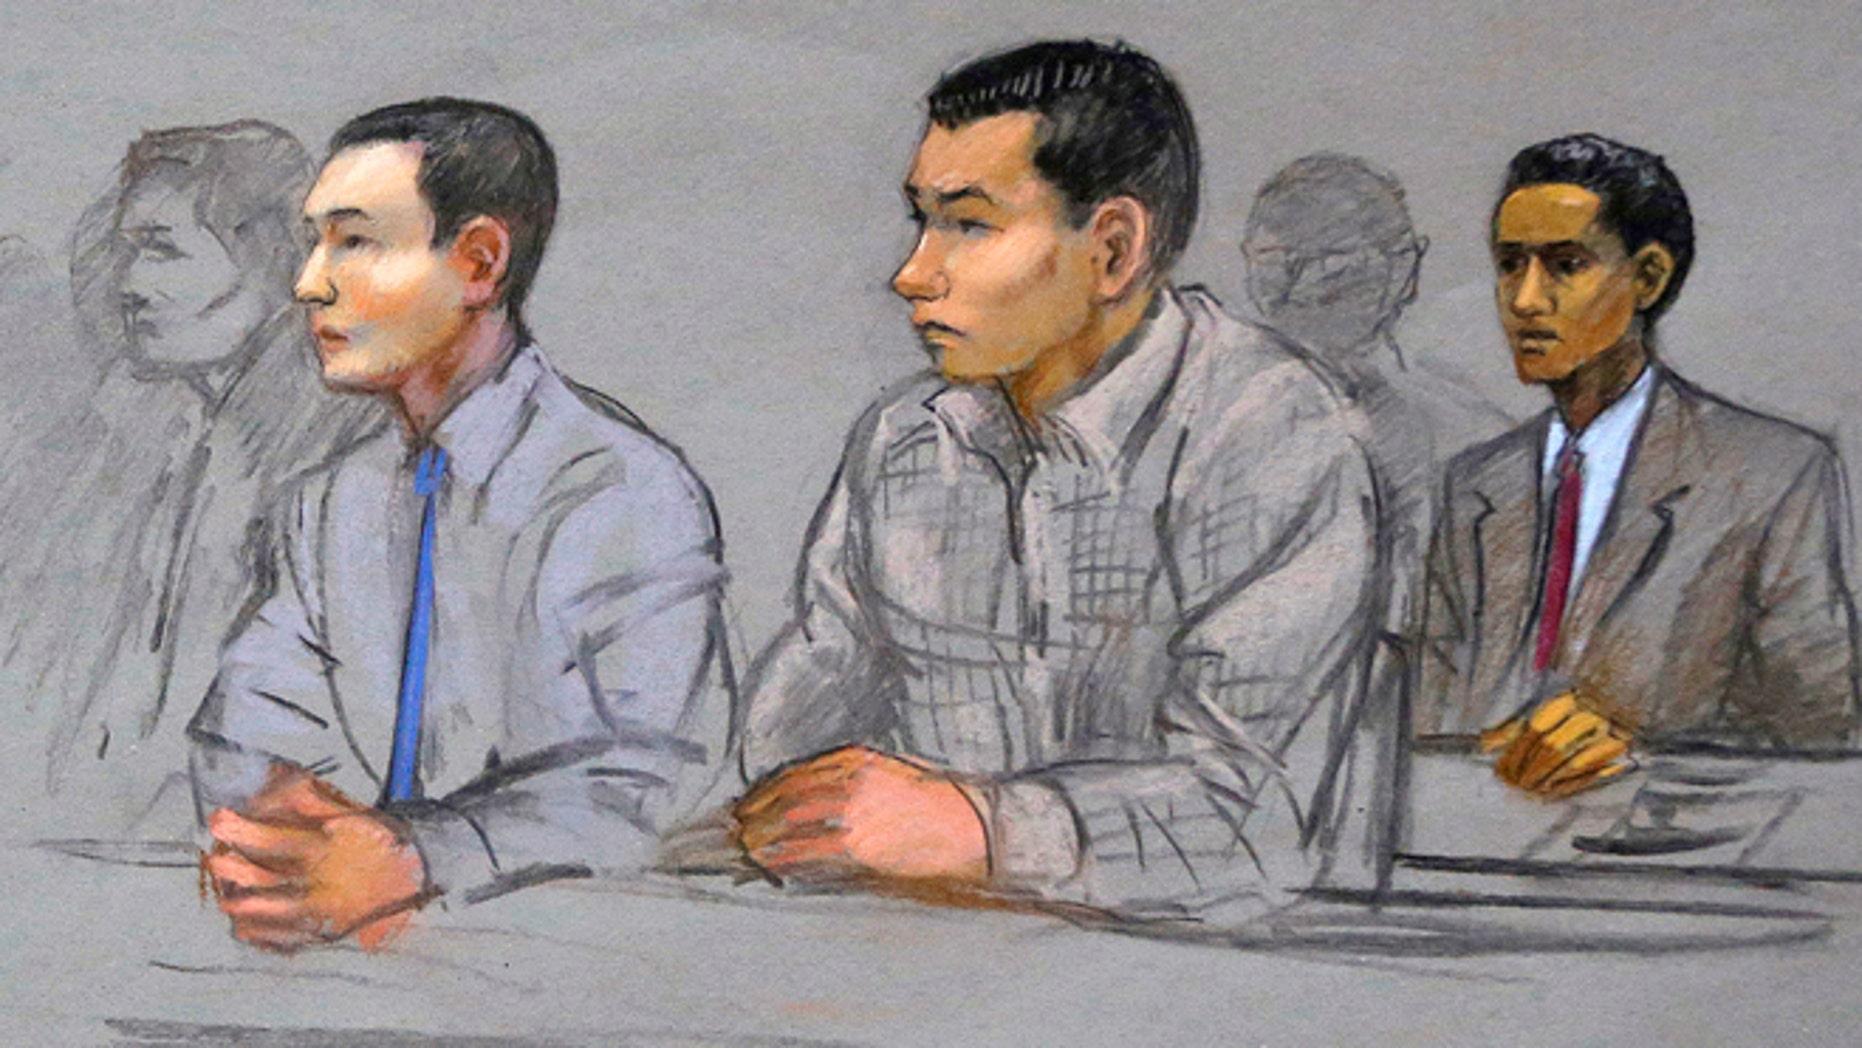 FILE courtroom sketch: Defendants Azamat Tazhayakov, left, Dias Kadyrbayev, center, and Robel Phillipos, right, college friends of convicted Boston Marathon bomber Dzhokhar Tsarnaev, sit during a hearing in federal court in Boston.